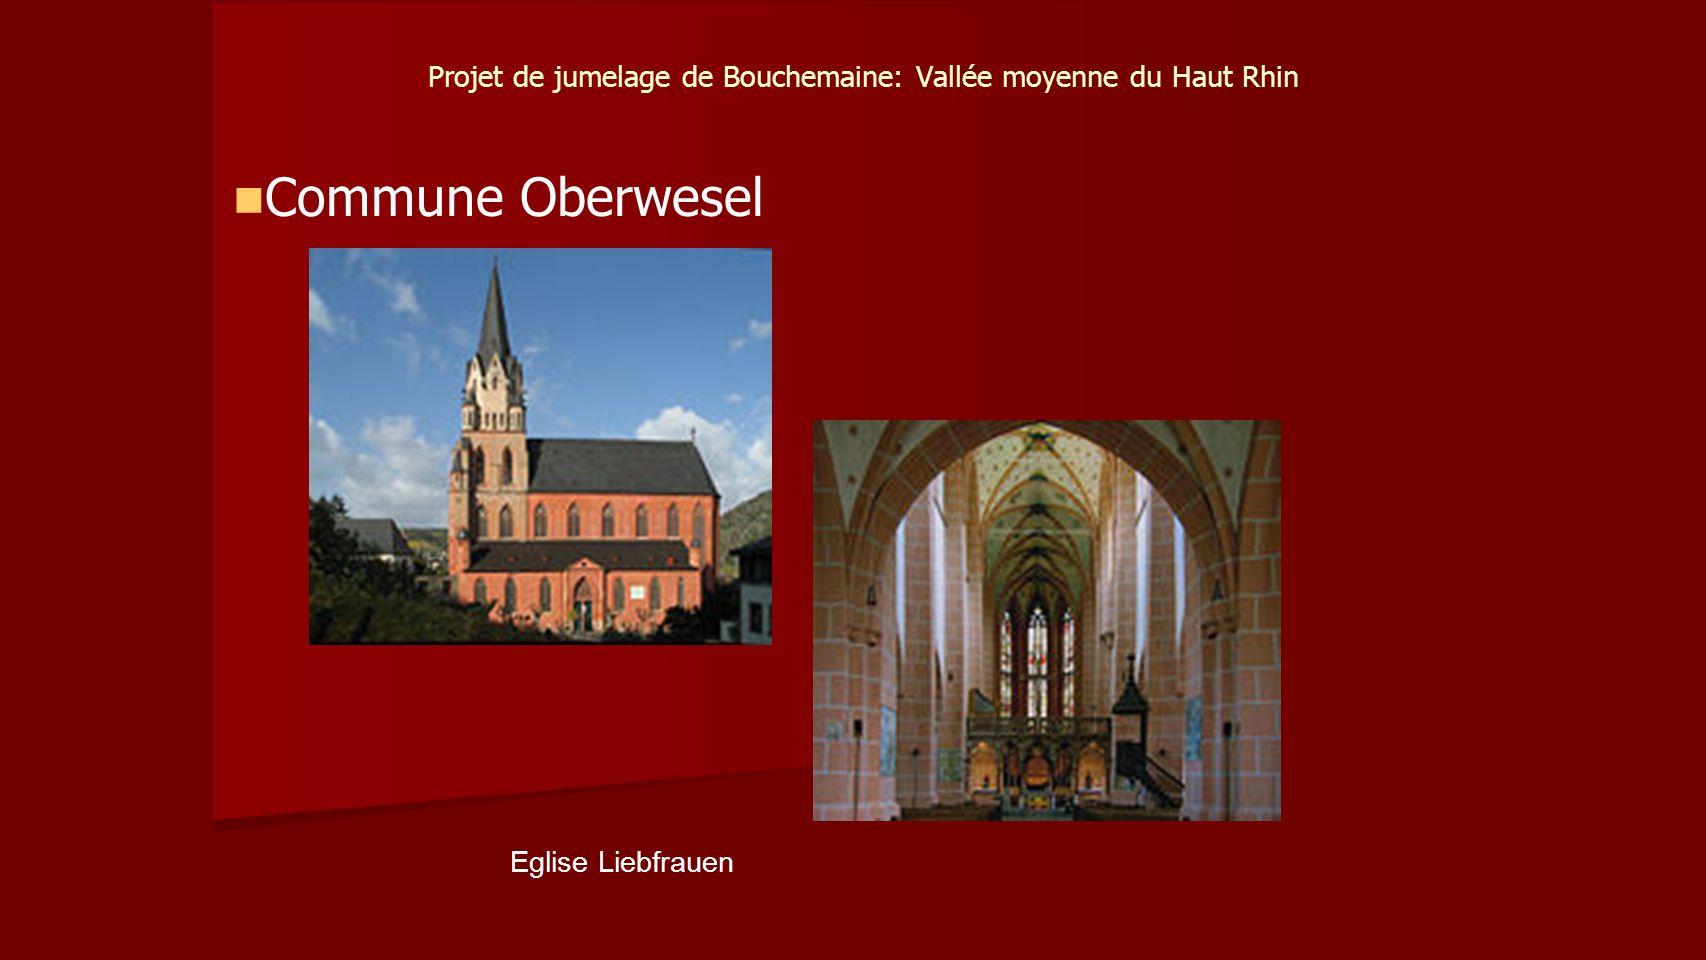 Projet de jumelage de Bouchemaine: Vallée moyenne du Haut Rhin Commune Oberwesel Eglise Liebfrauen